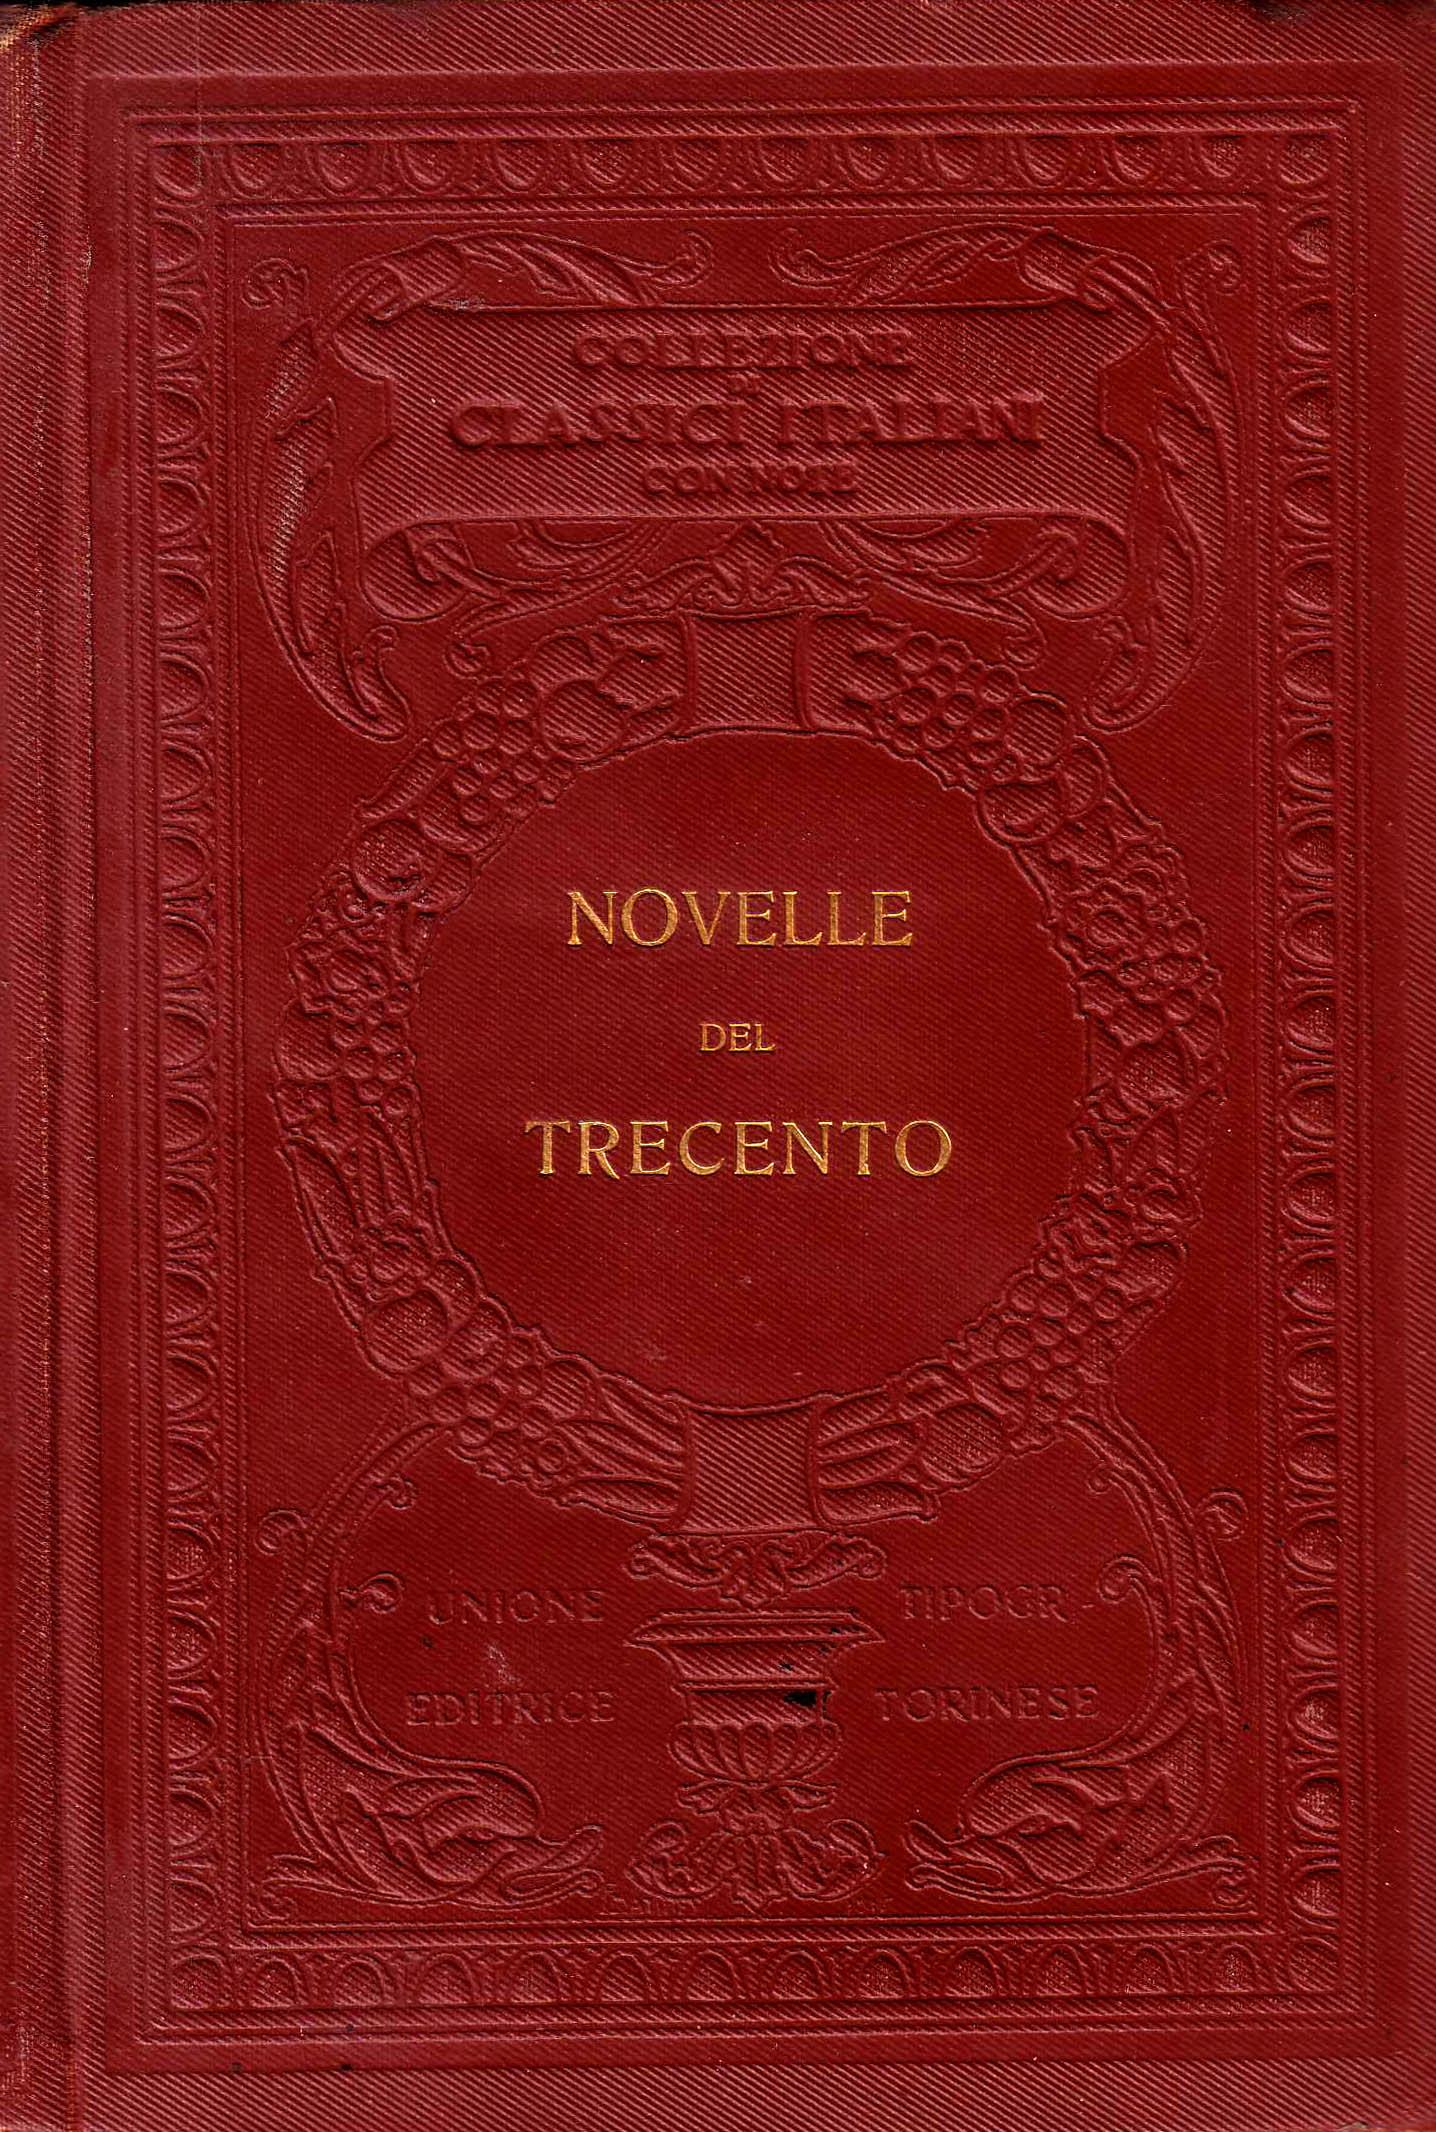 Novelle del Trecento